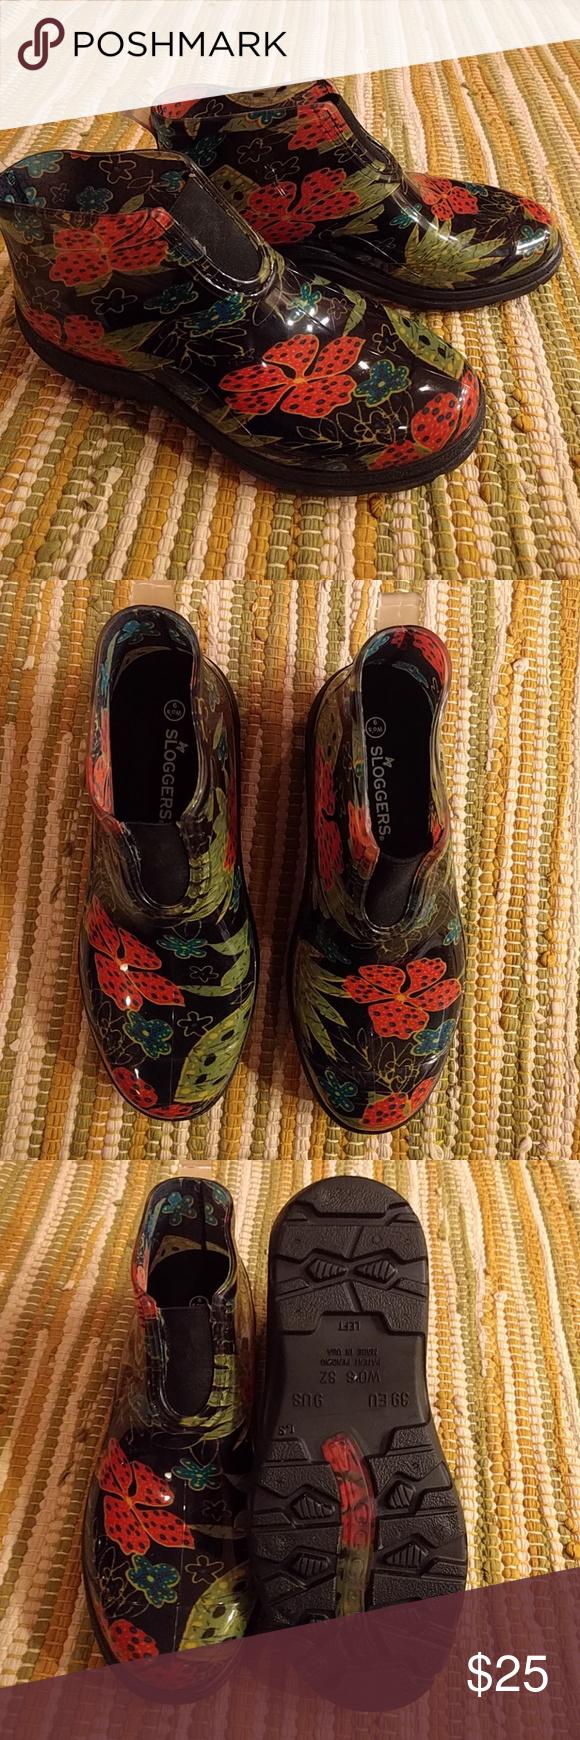 BNWOT Sloggers Waterproof Ankle Boots | My Posh Picks | Pinterest